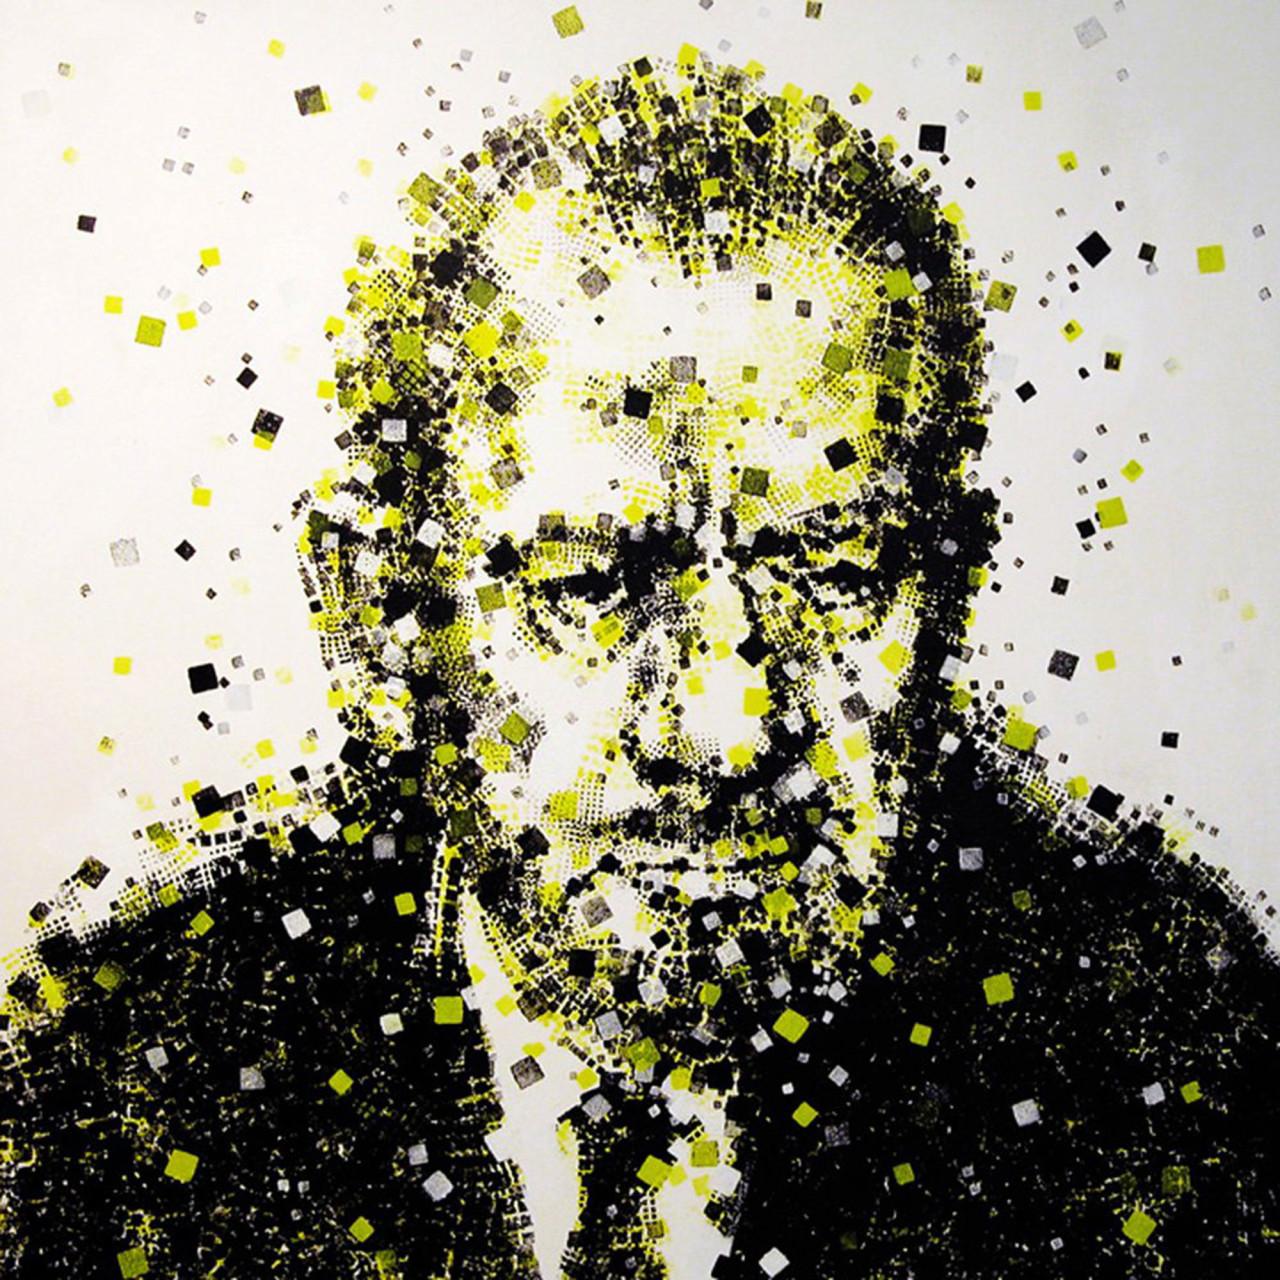 John Steinbeck, 2009, tecnica mista su tavola 120x120 cm